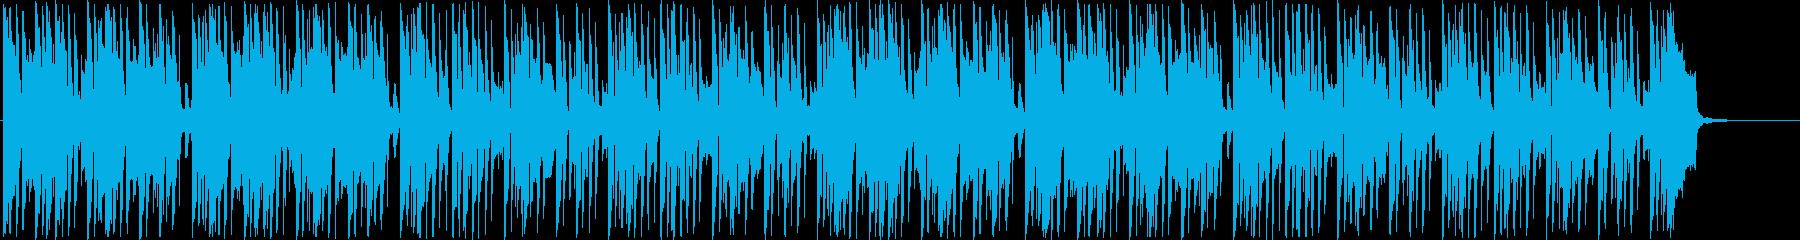 HIPHOP風 若者 エレクトロ 先進的の再生済みの波形